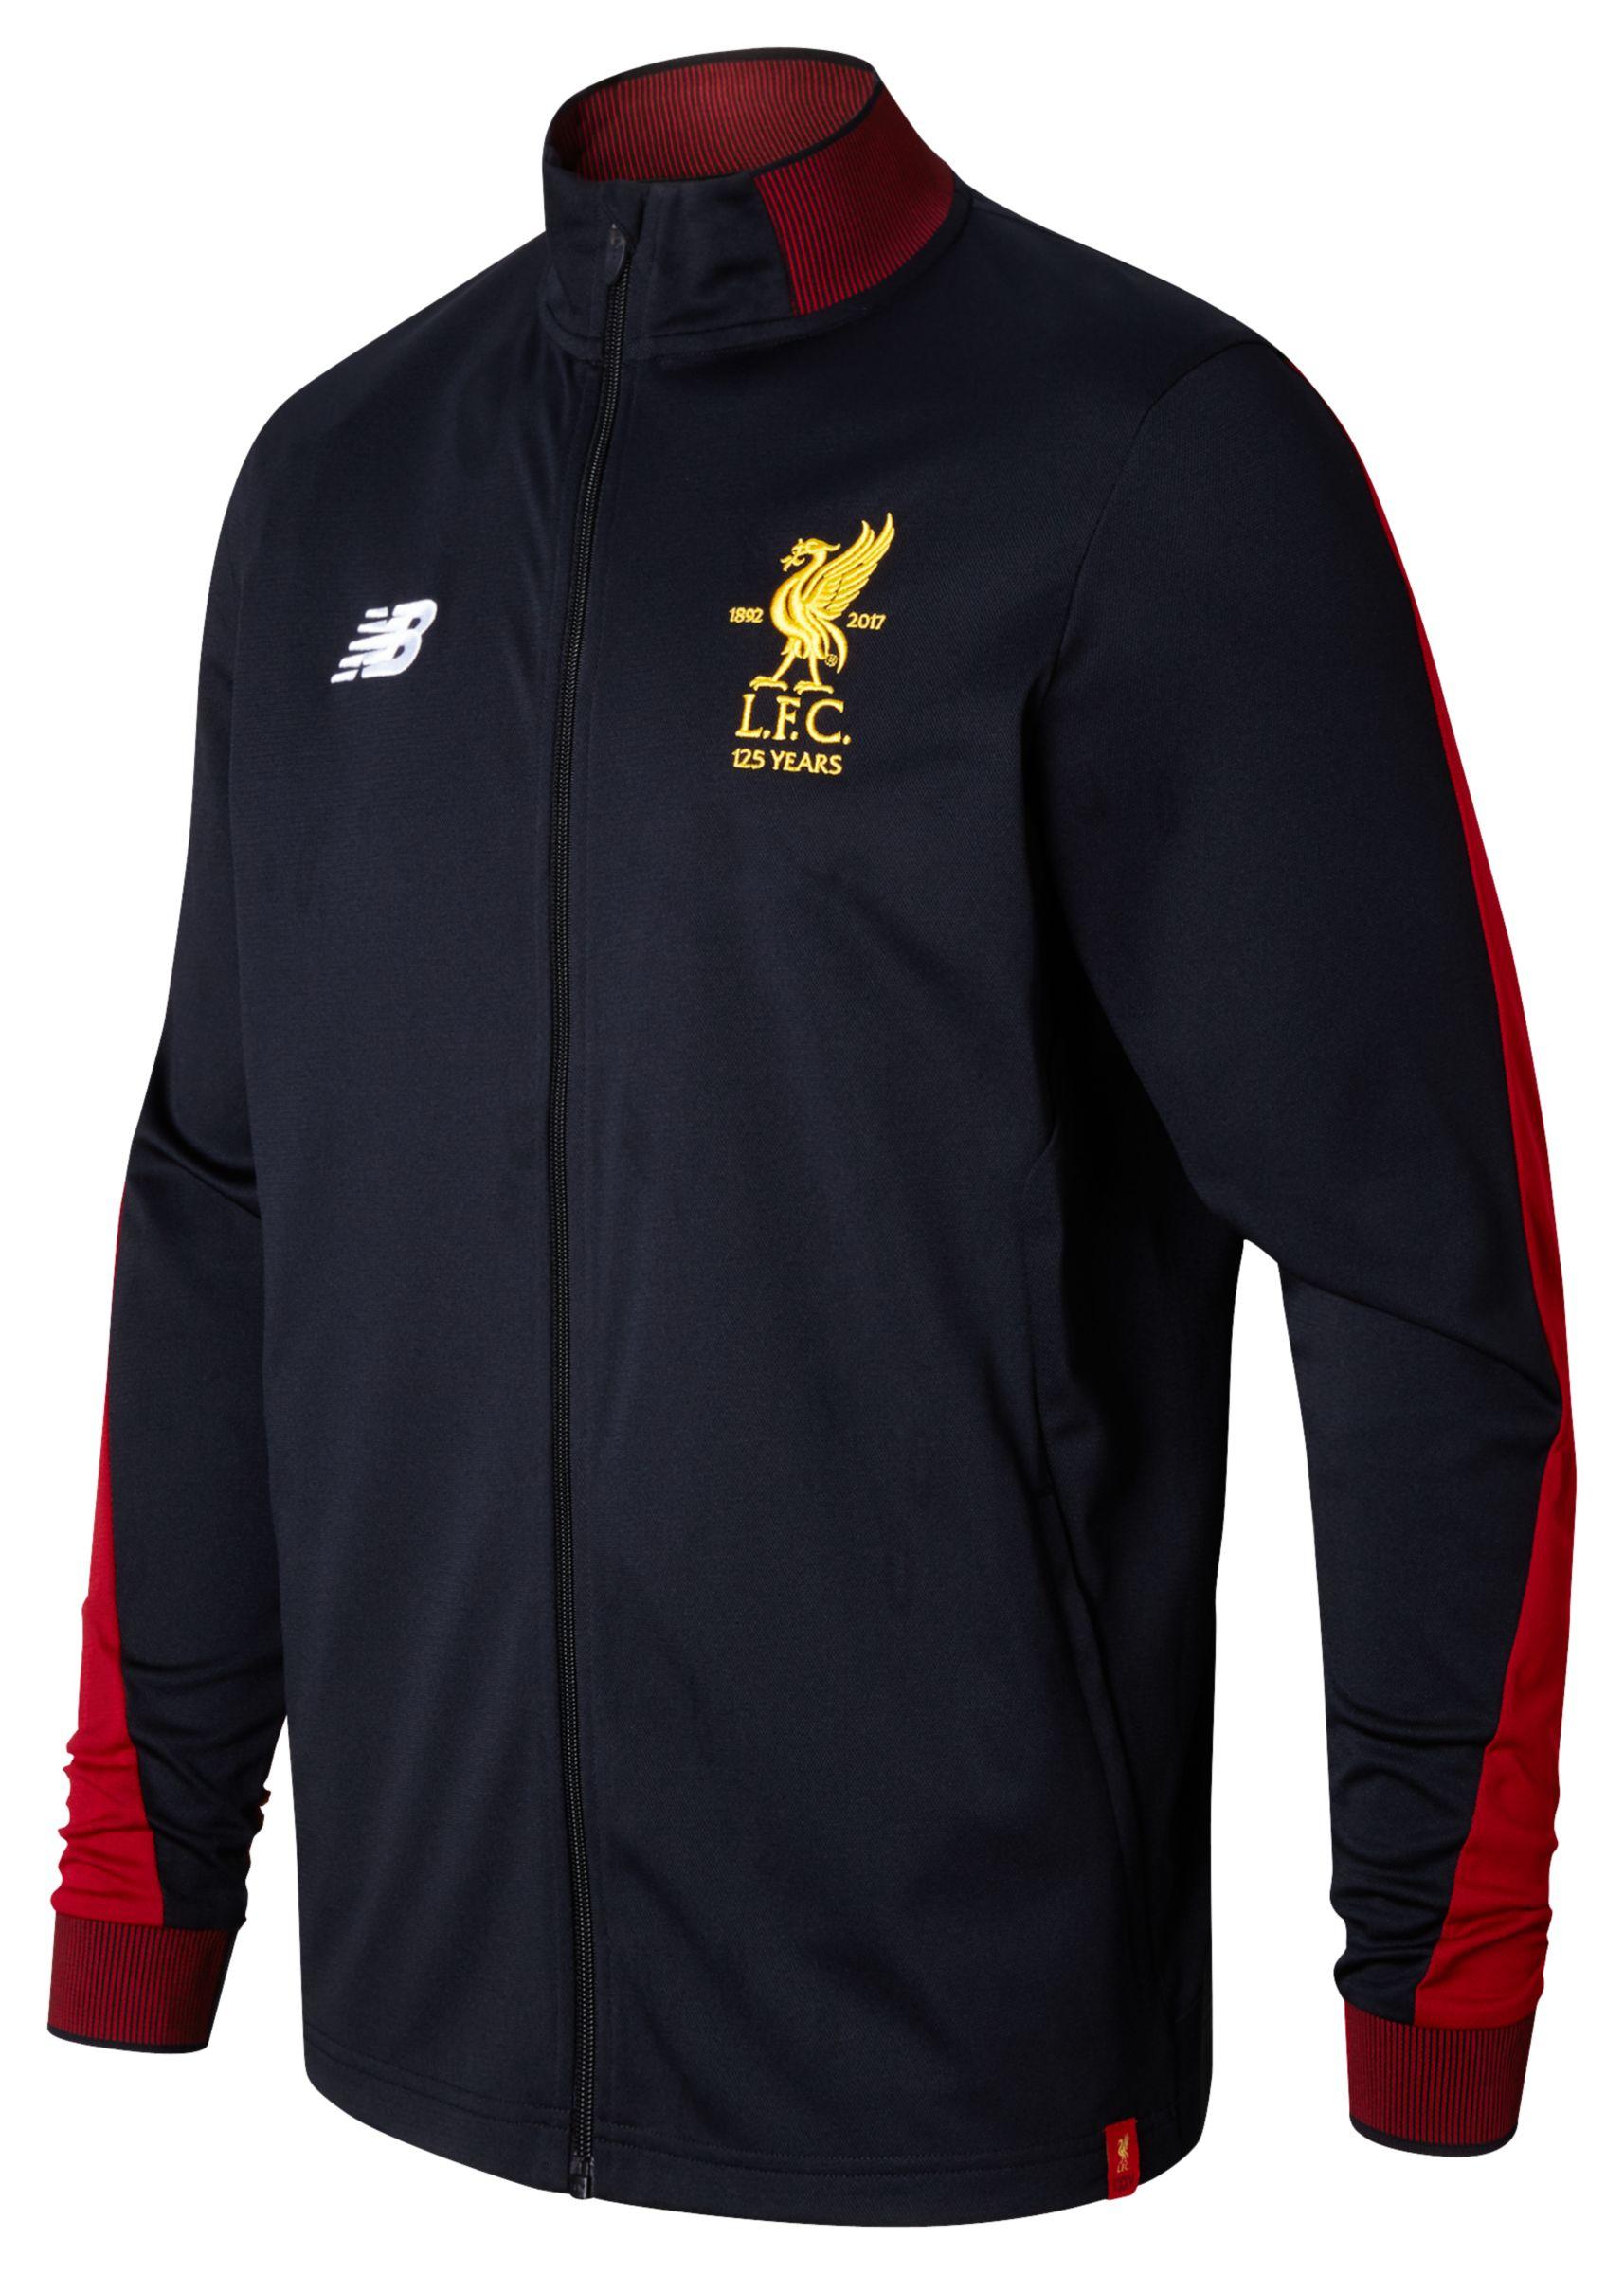 NB LFC Elite Training Presentation Jacket, Black